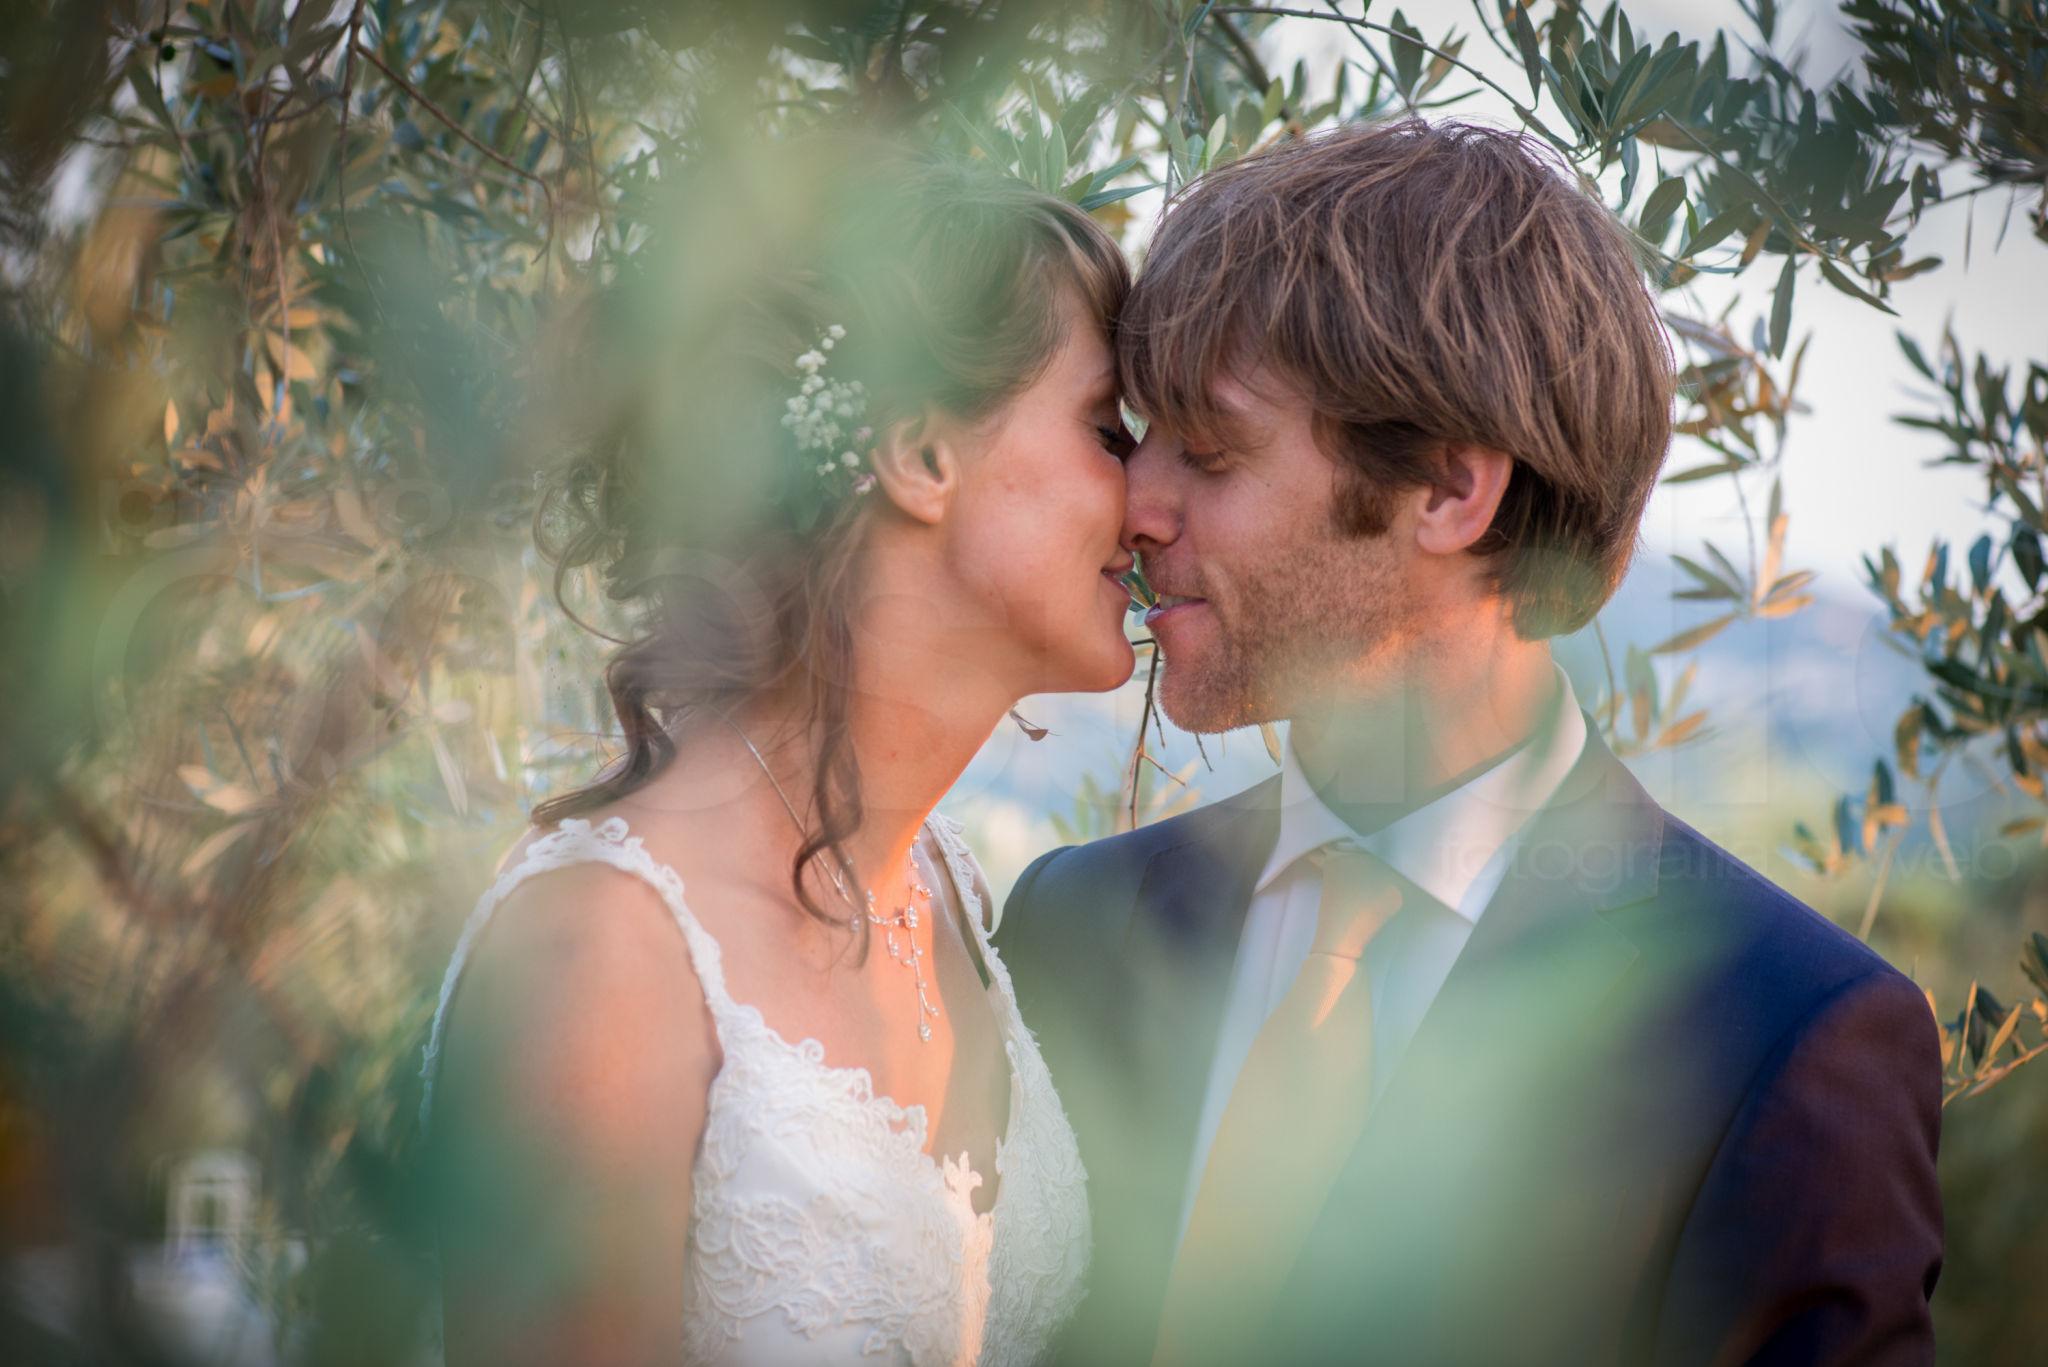 https://lnx.mirkone.it/wp-content/uploads/2015/07/fotografo-matrimoni-faenza-0026.jpg